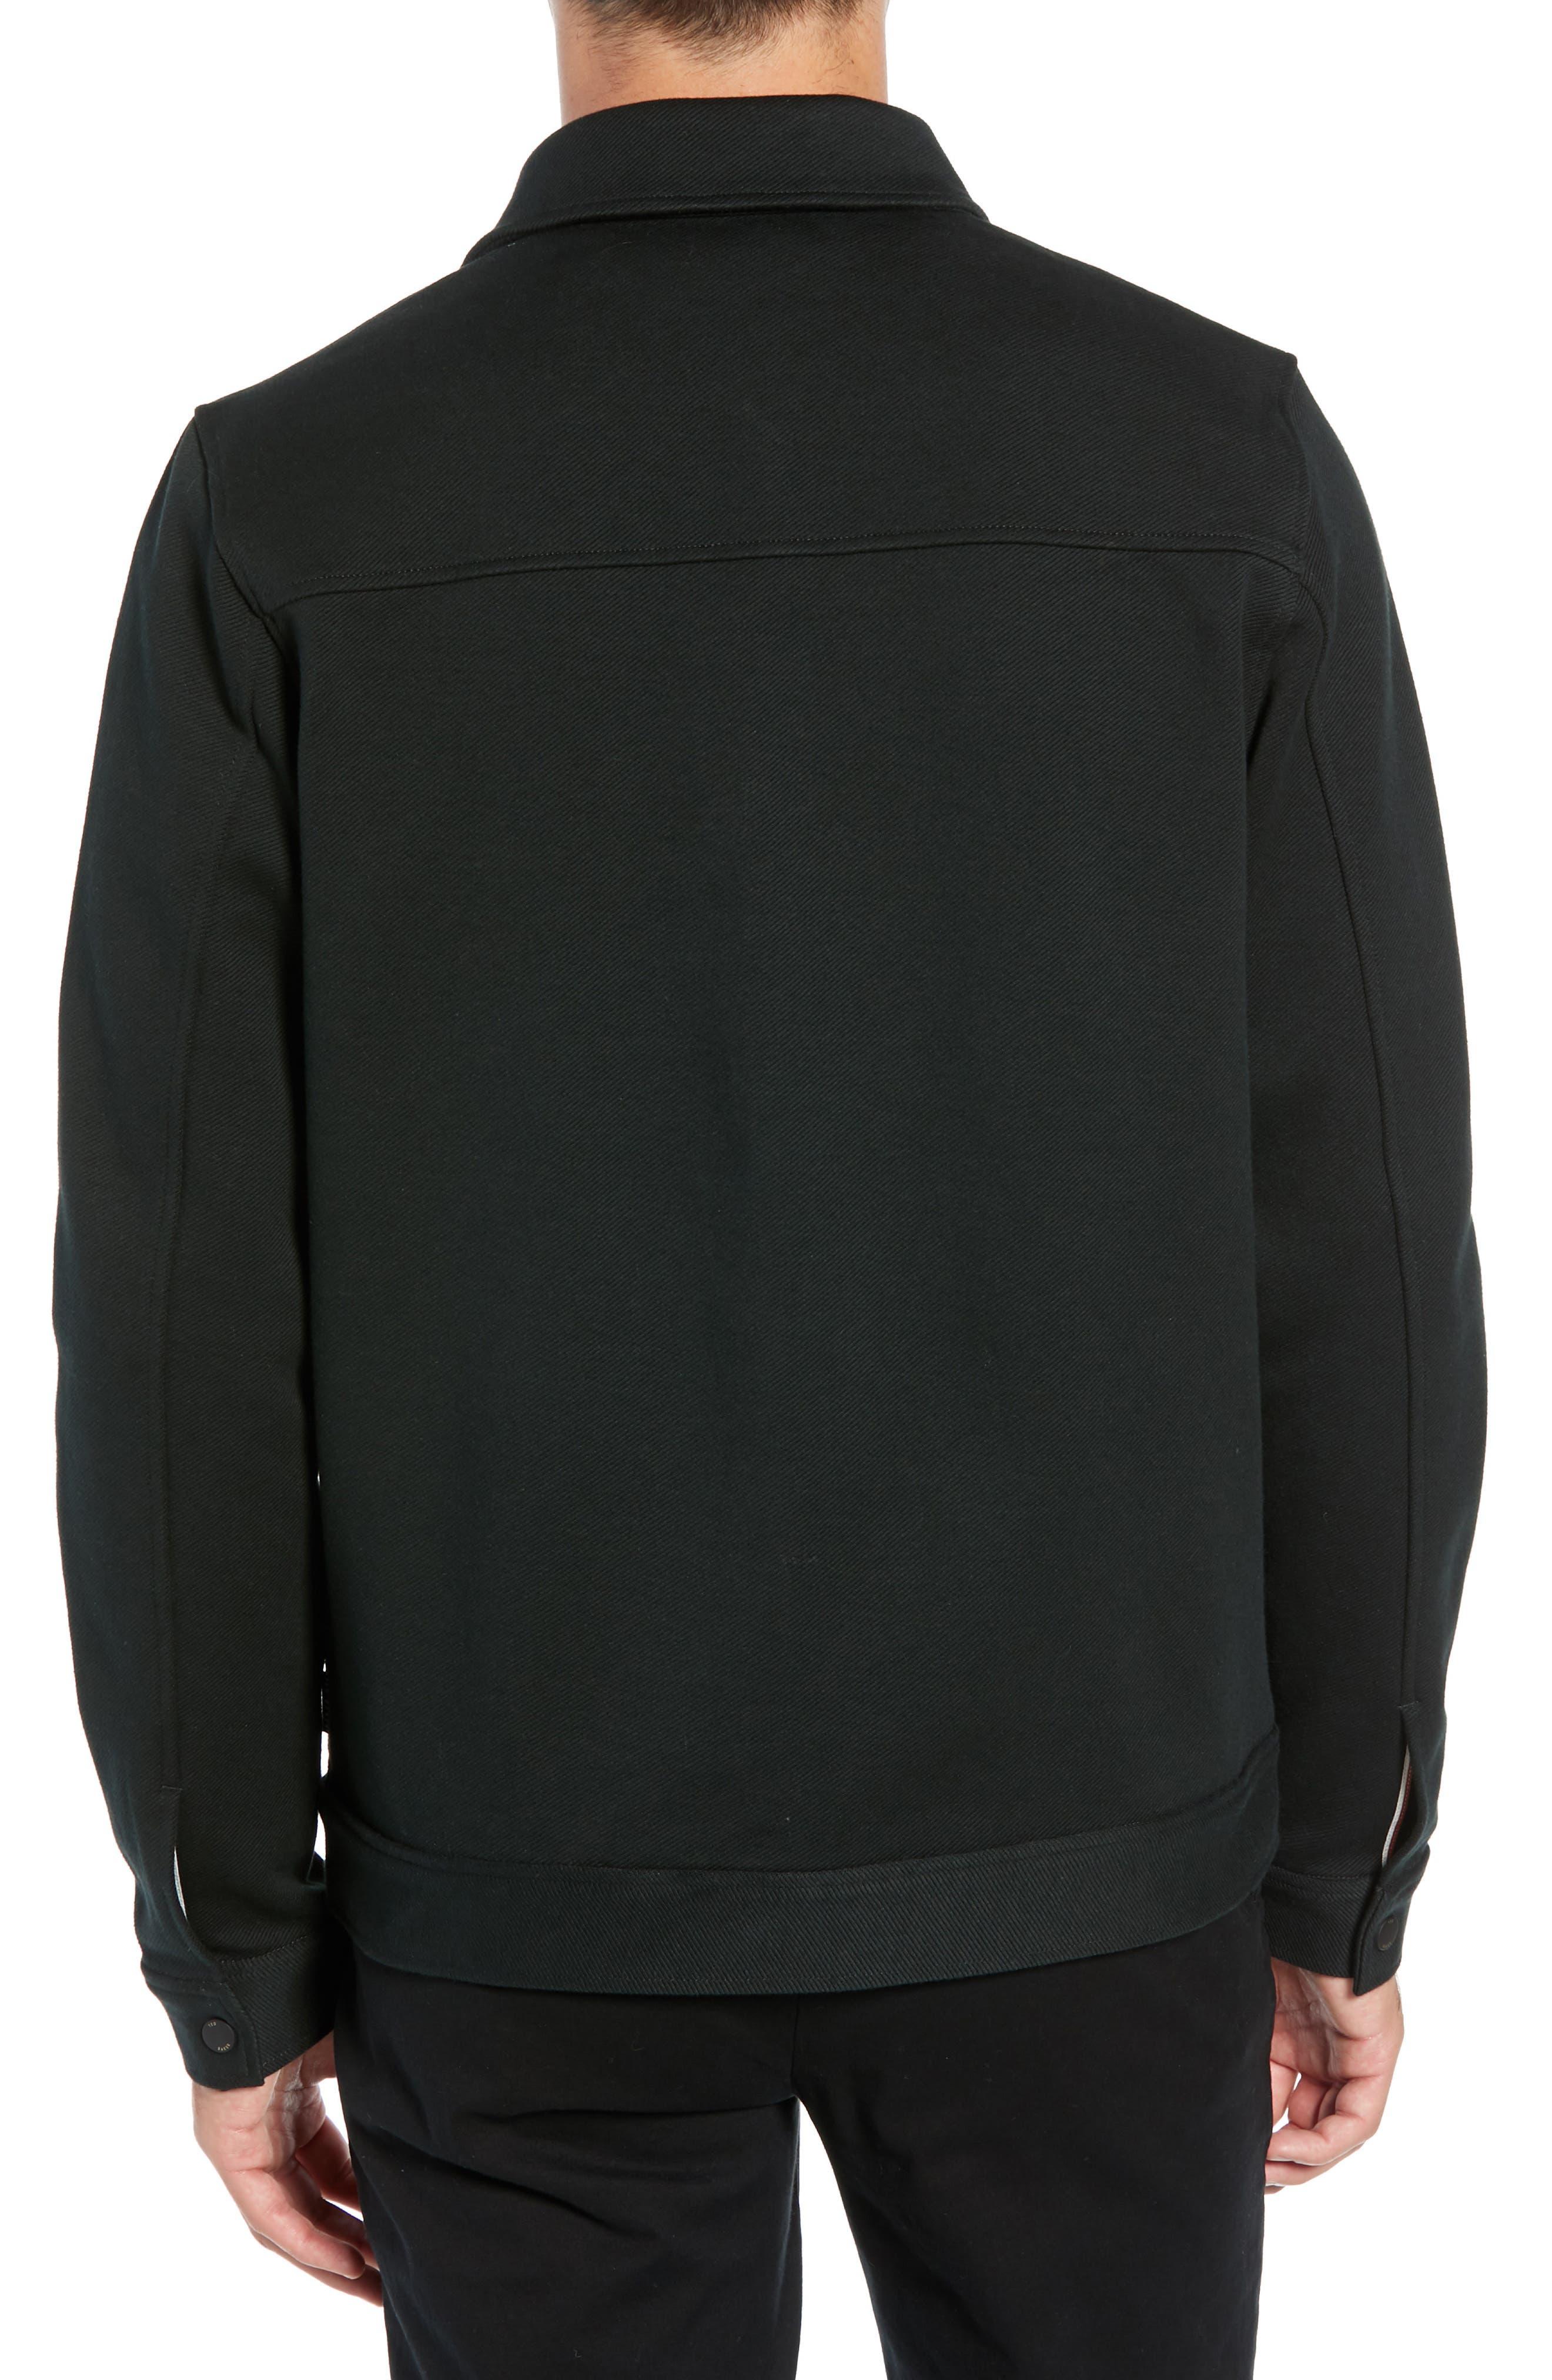 Danett Tall Twill Jacket,                             Alternate thumbnail 2, color,                             BLACK